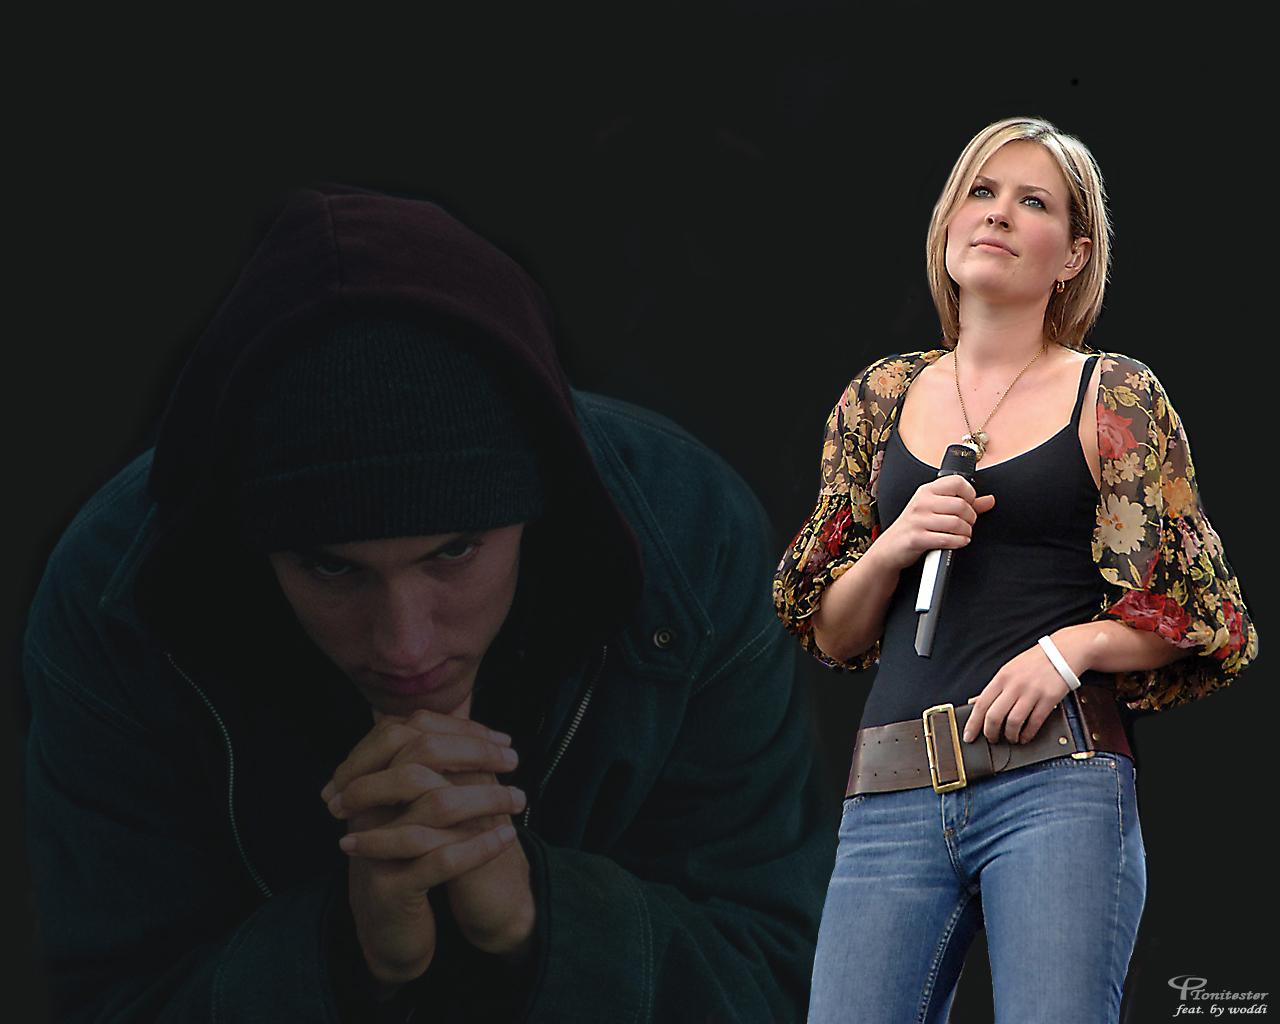 STAN BAIXAR - FT.DIDO EMINEM VERSION MUSICA LONG